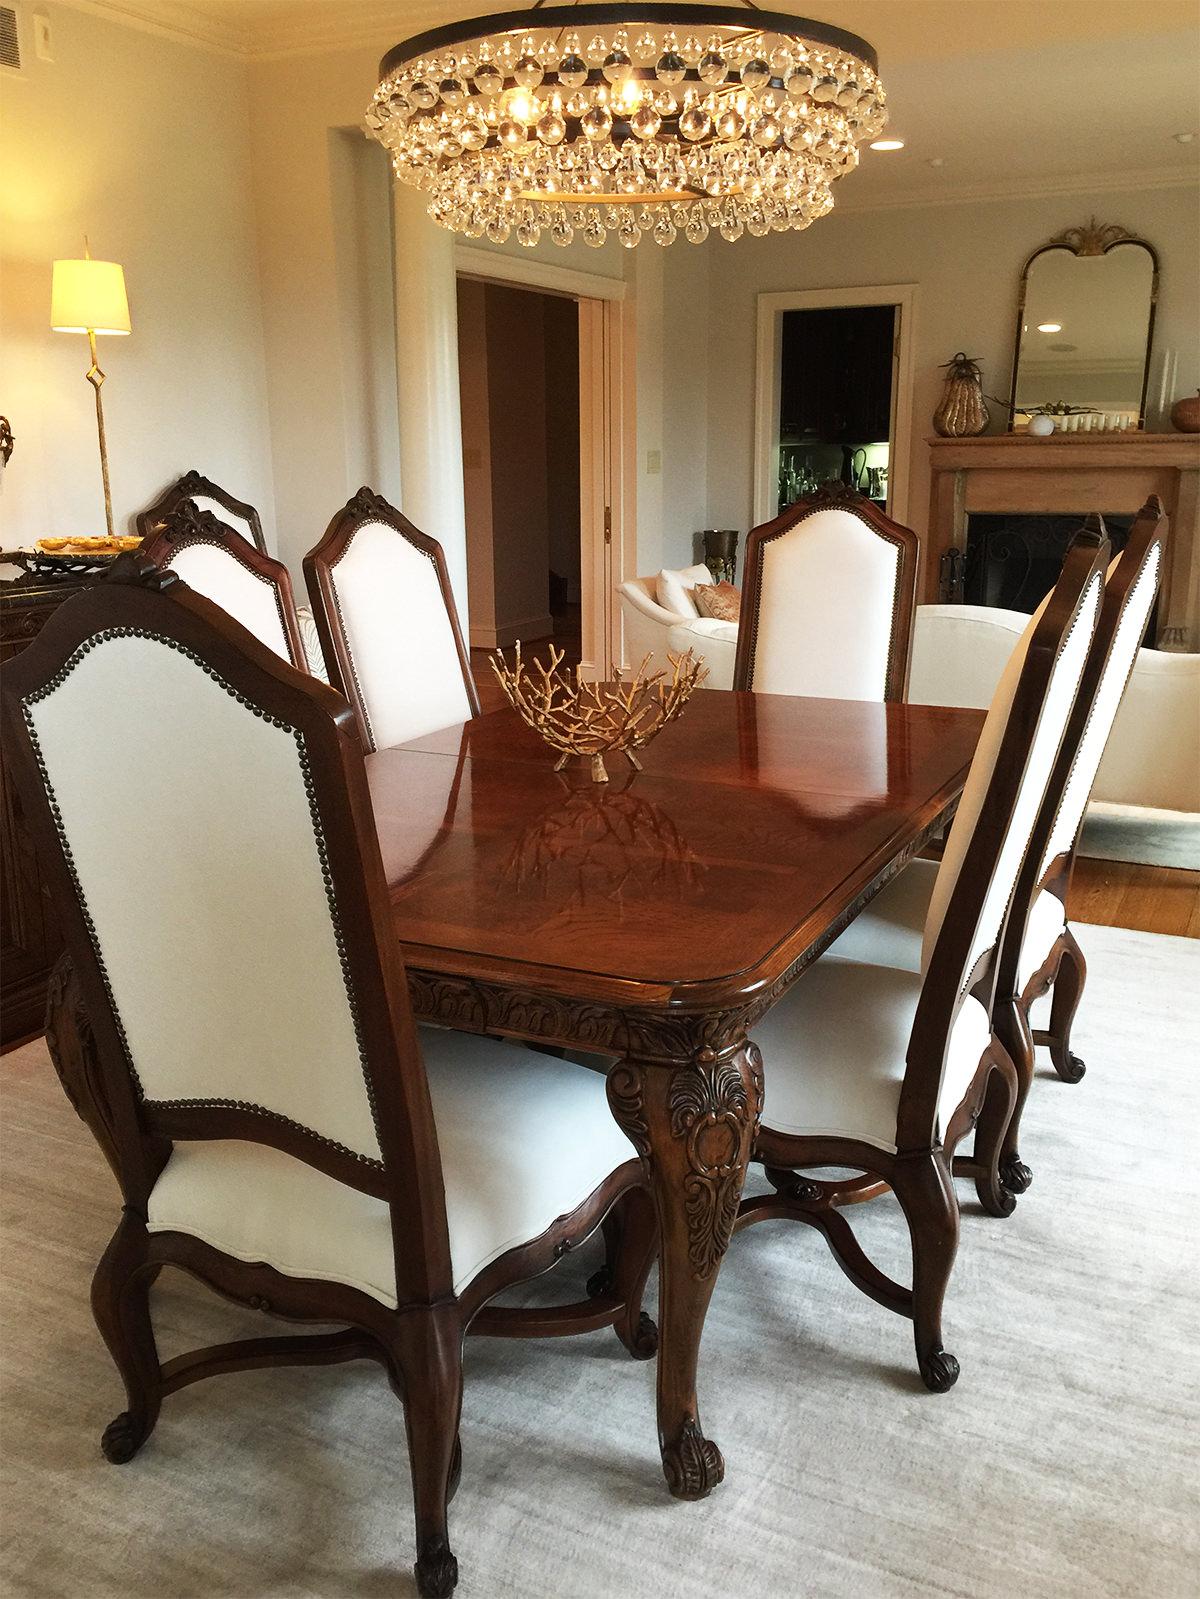 custom-upholstery-dining-room-DBH-designs-willow-street-pennsylvania-2.JPG